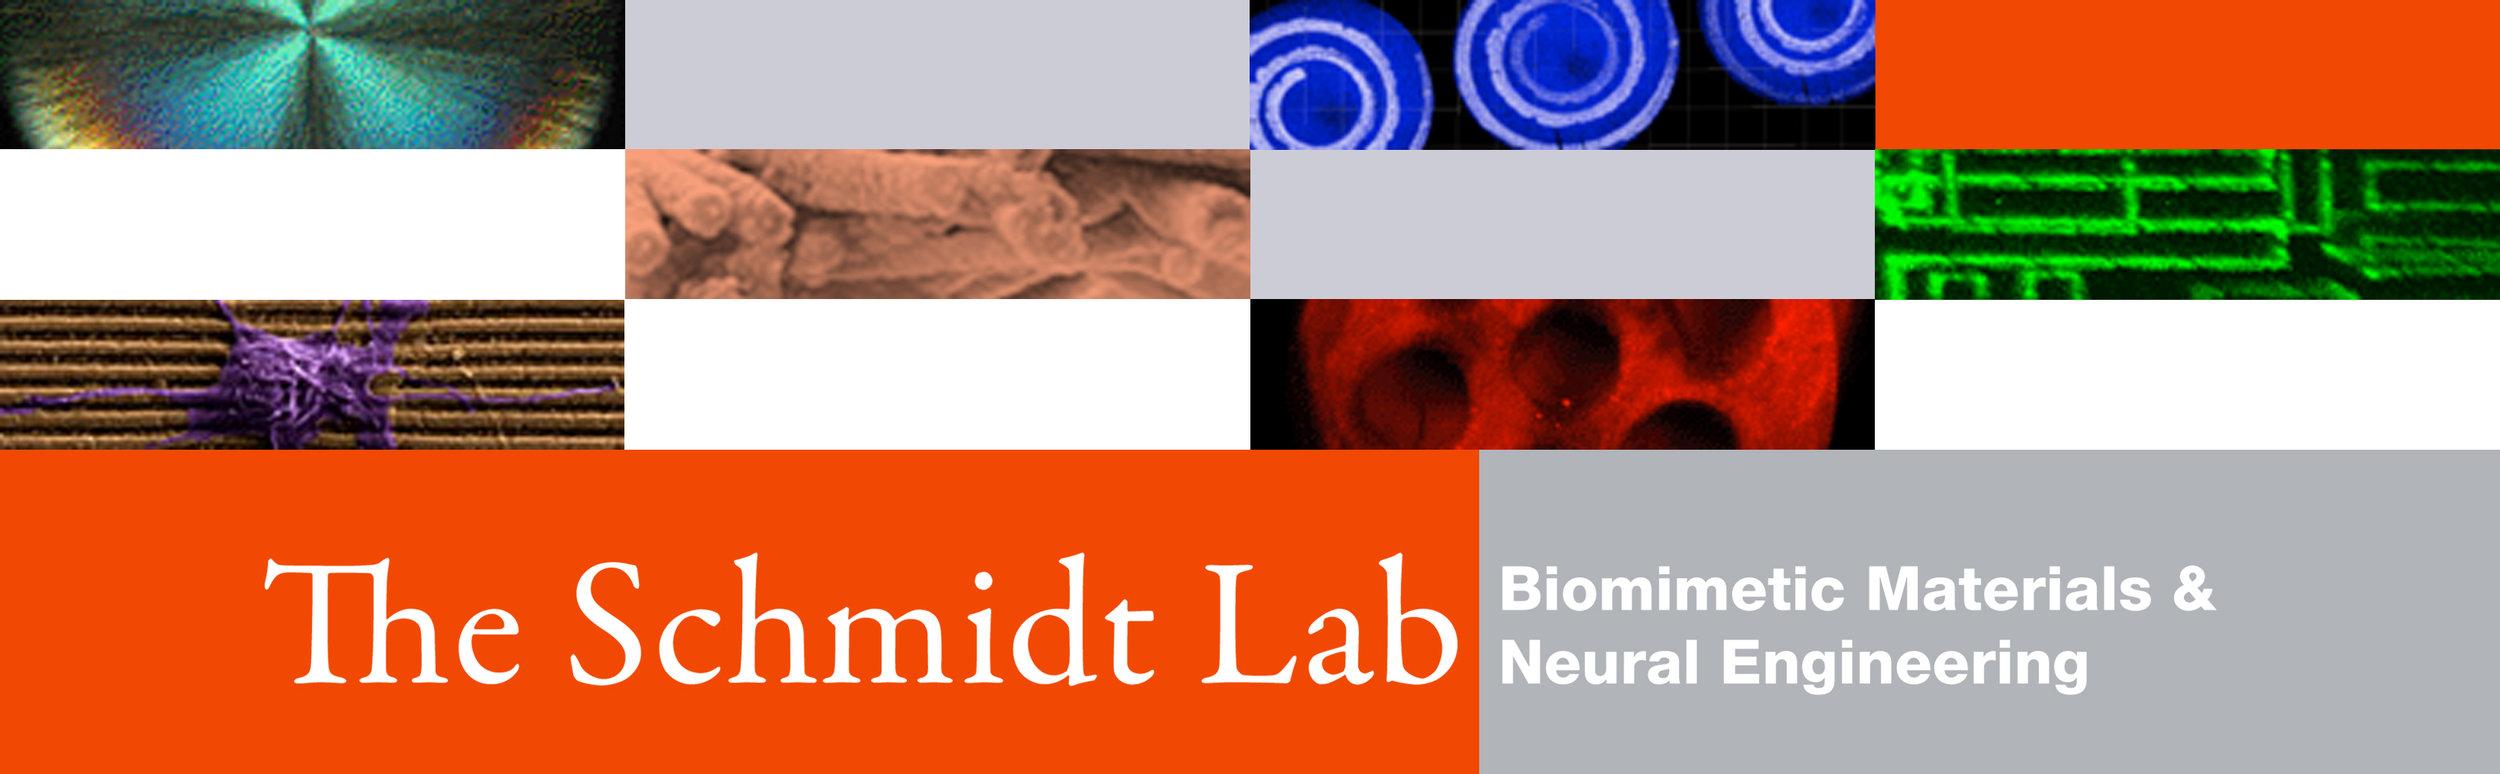 UF BME Schmidt Lab8-13.jpg